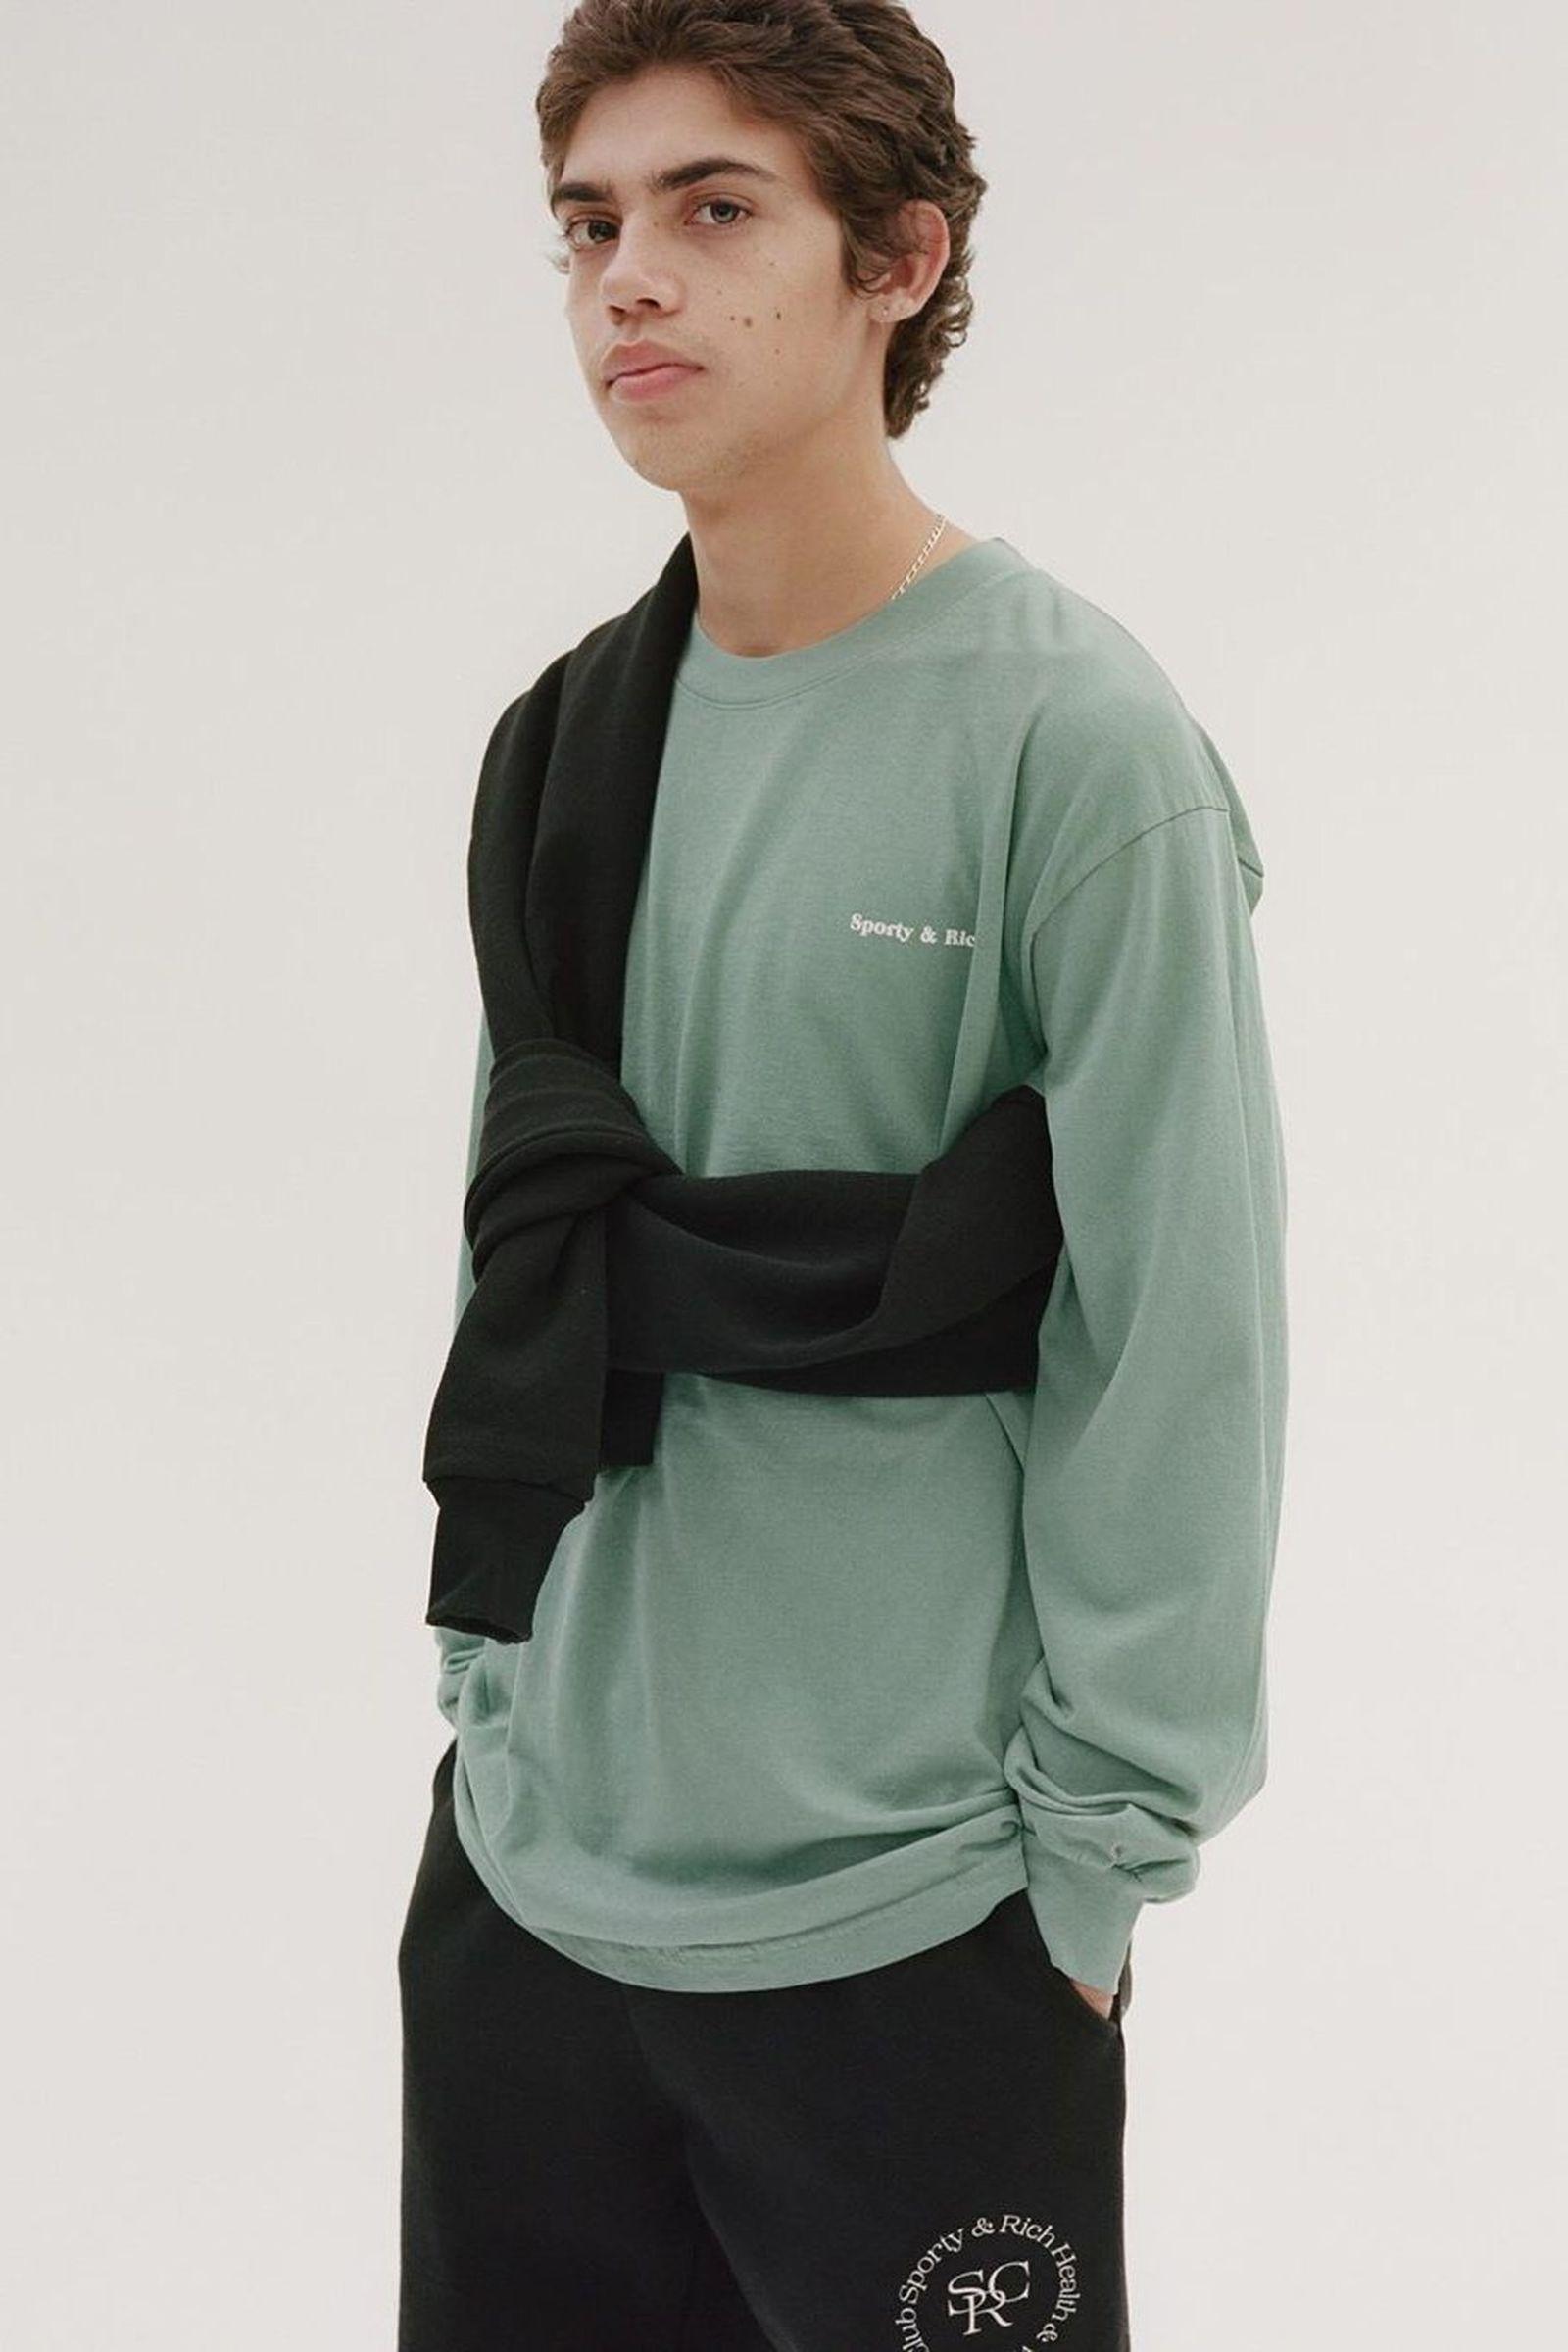 enter-age-silent-streetwear-08